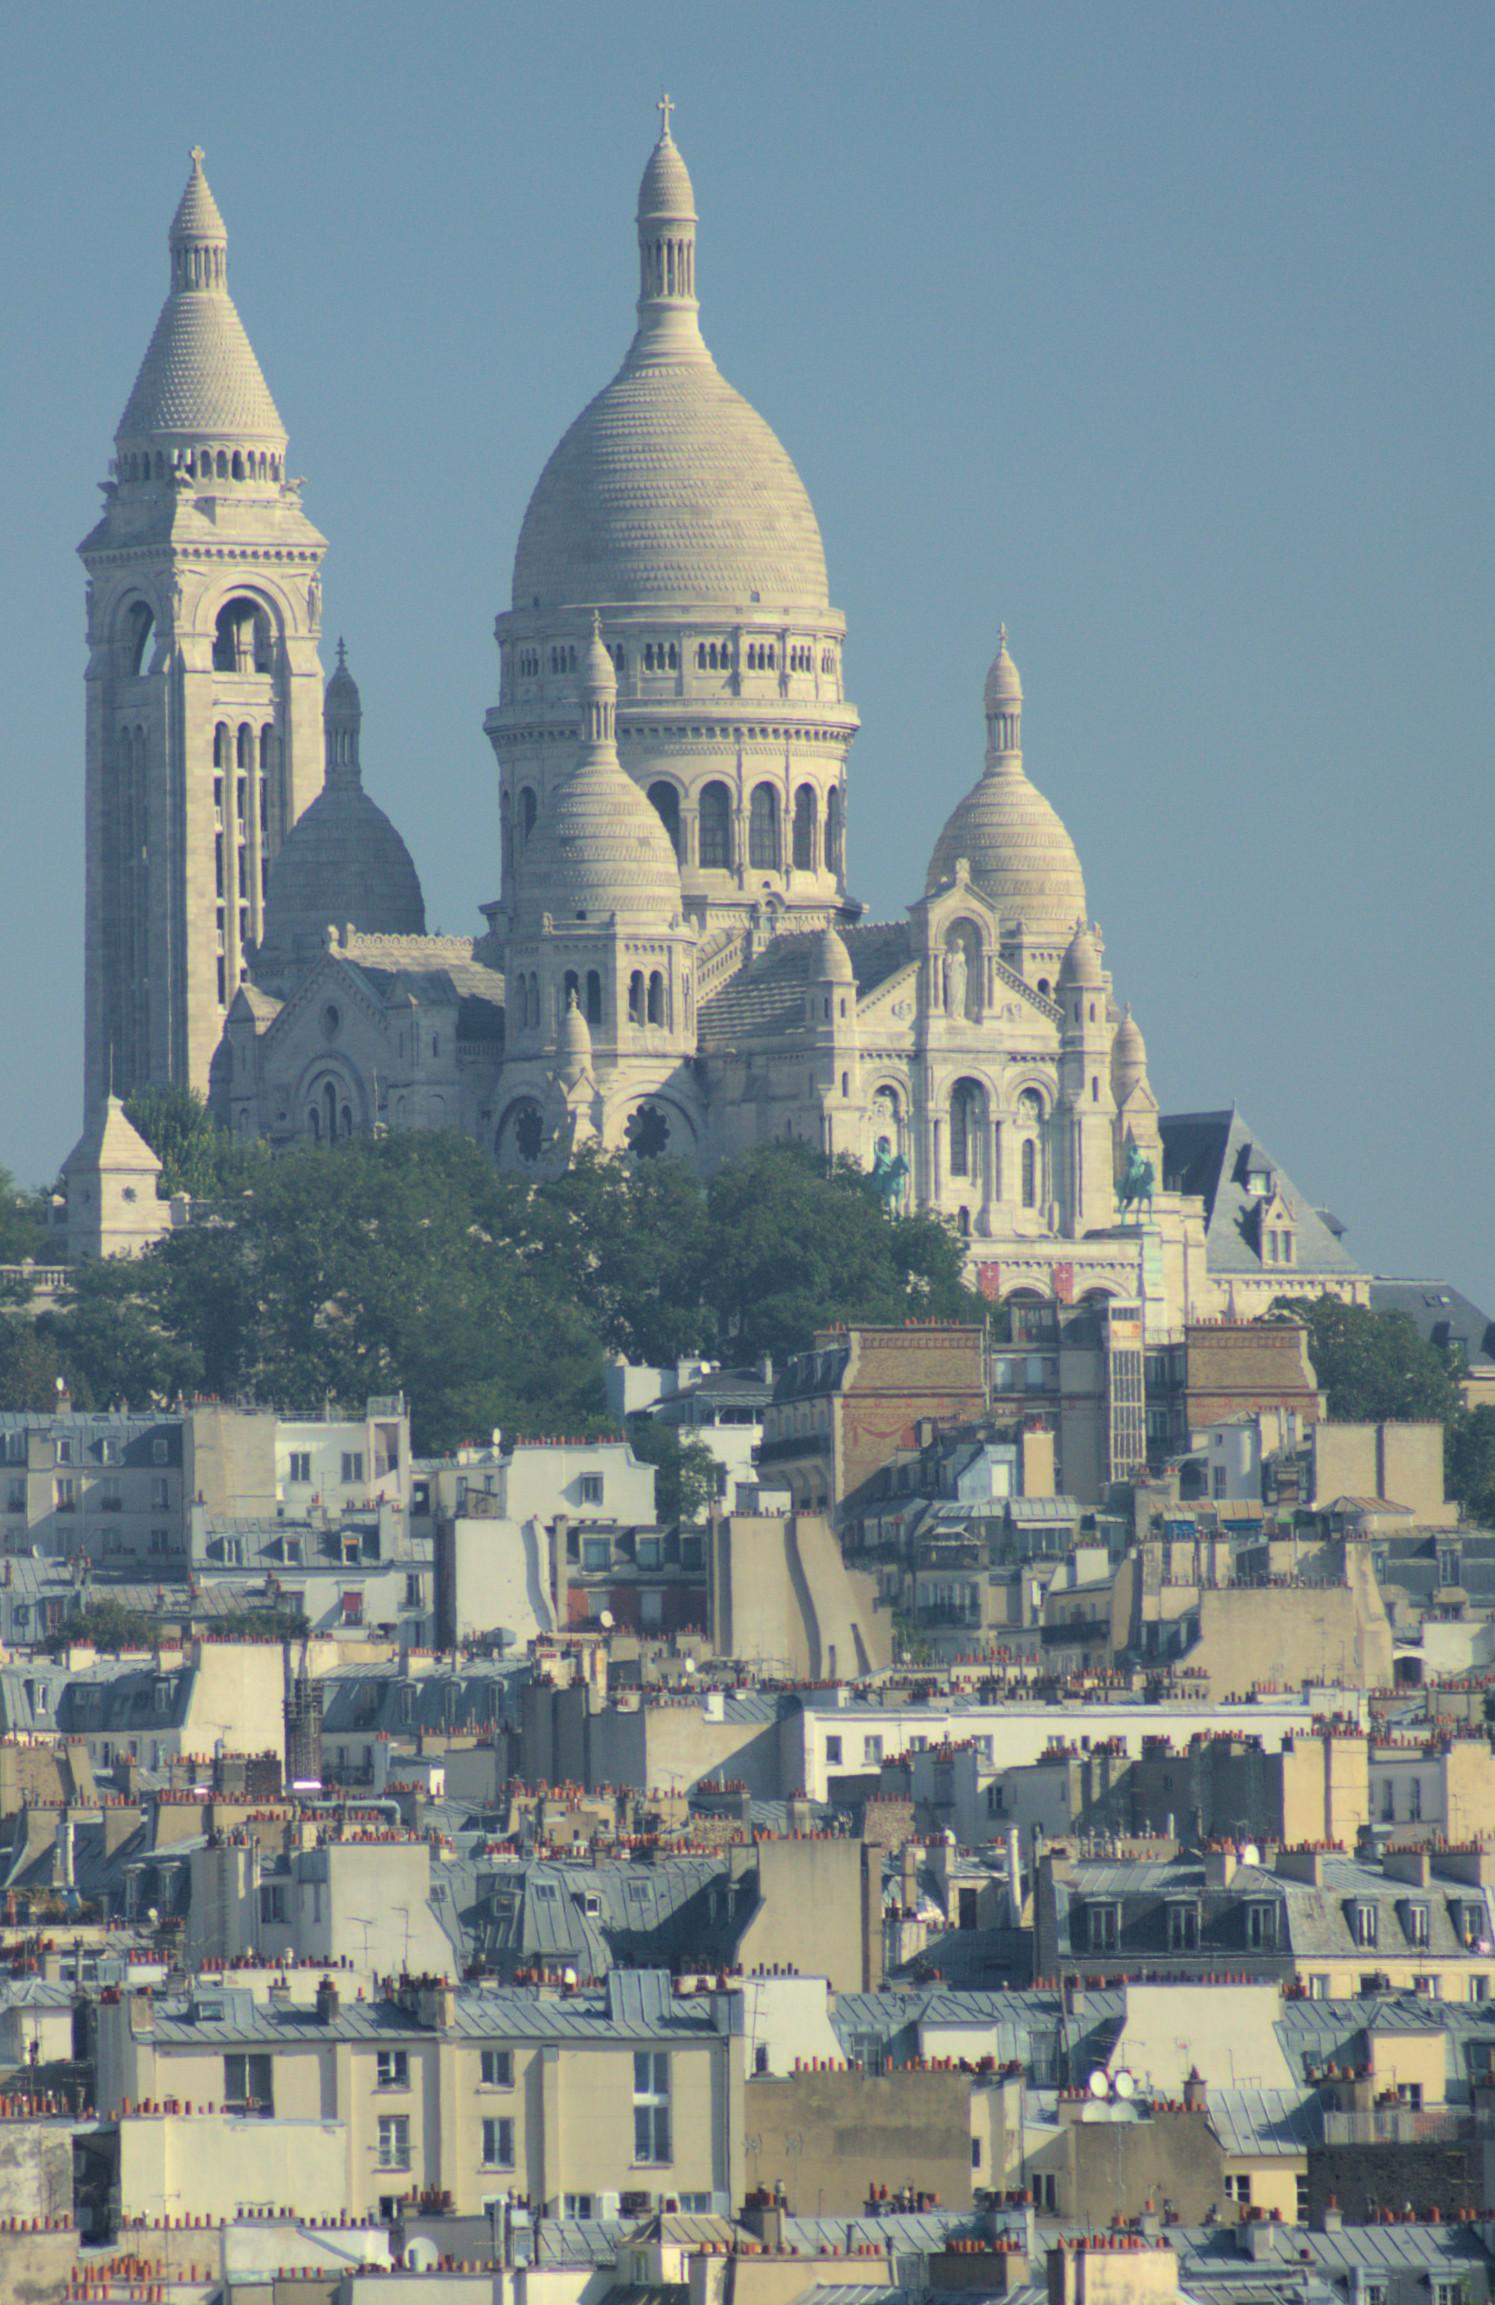 Galeries Lafayette rooftop view of Sacre Coeur.